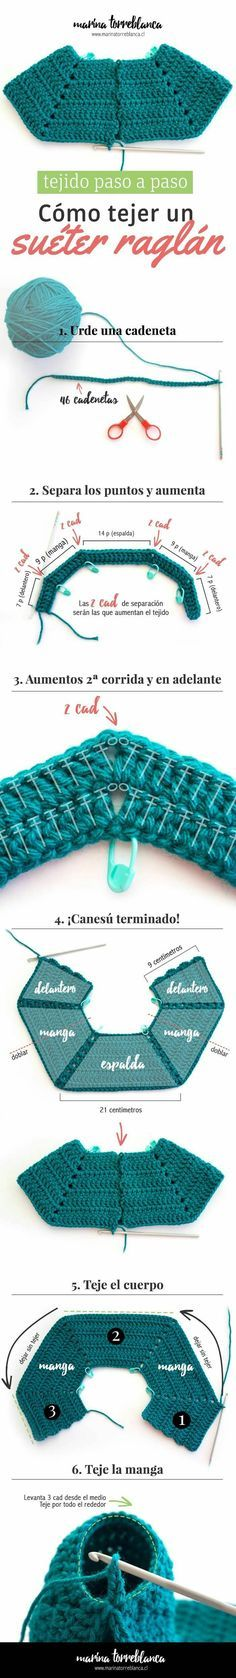 28 best como hacer chambritas en crochet images on Pinterest | Coast ...